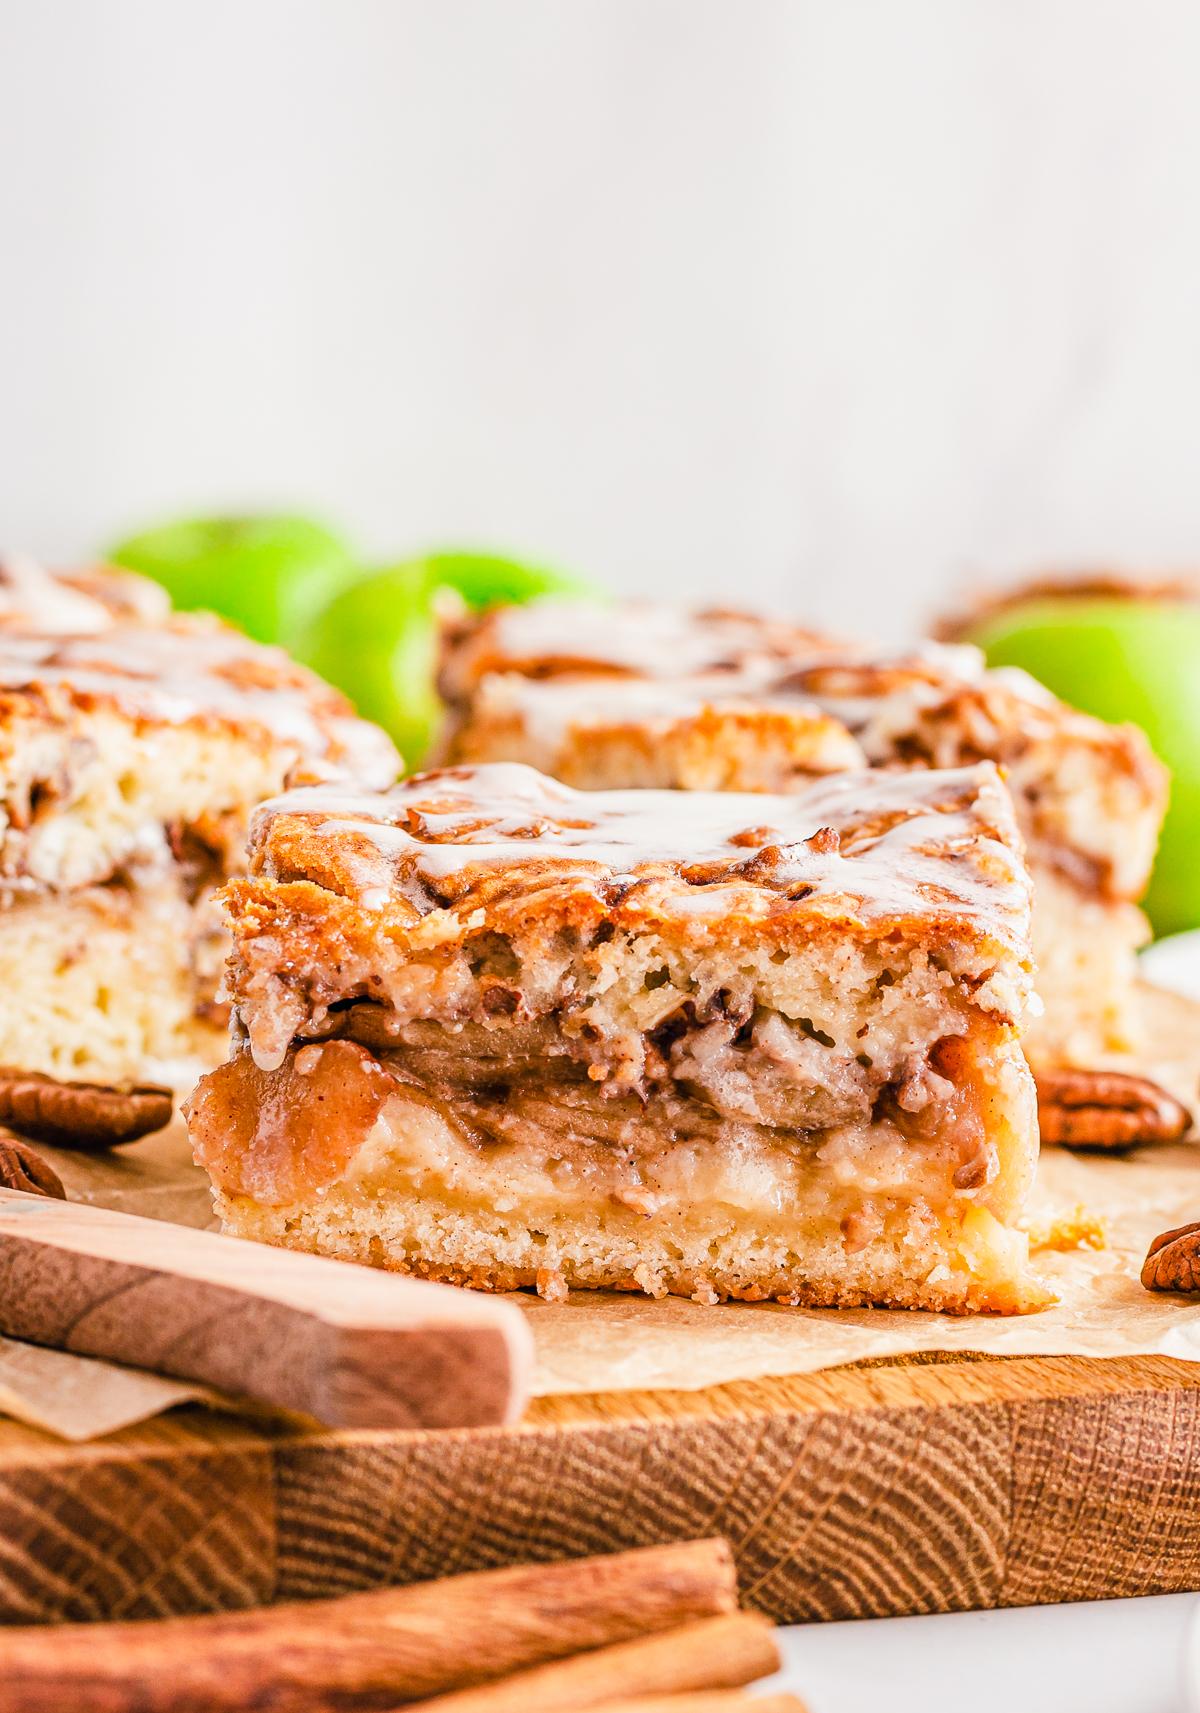 Cut Apple Pie Bars on wooden board glazed with cinnamon sticks.